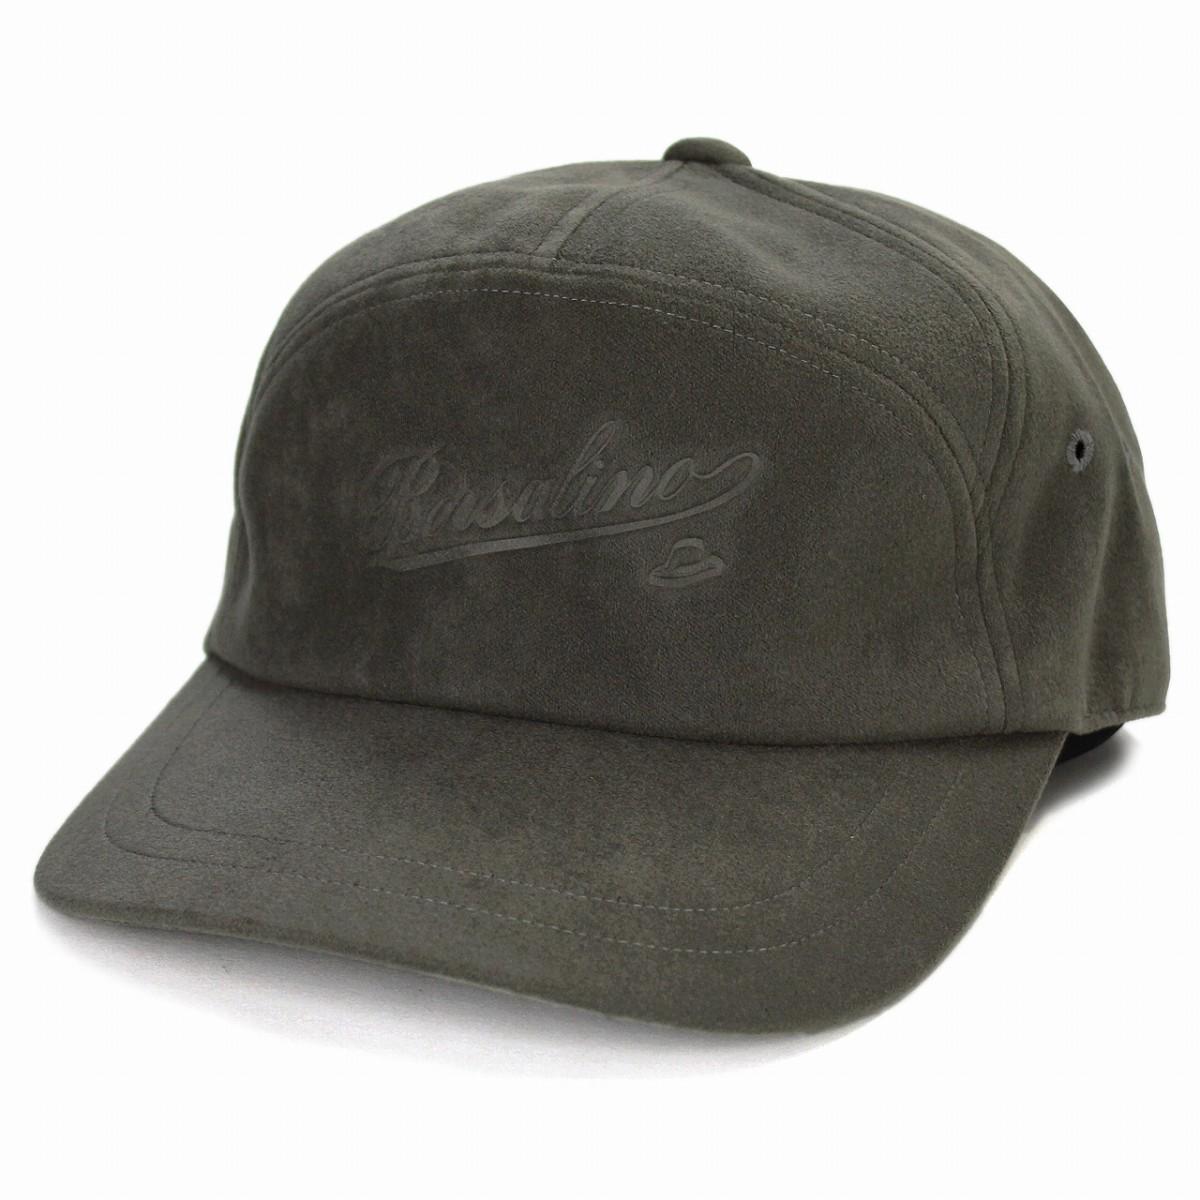 81ba9d6d42a ELEHELM HAT STORE  Baseball cap gentleman logo cap adult Shin pull ...